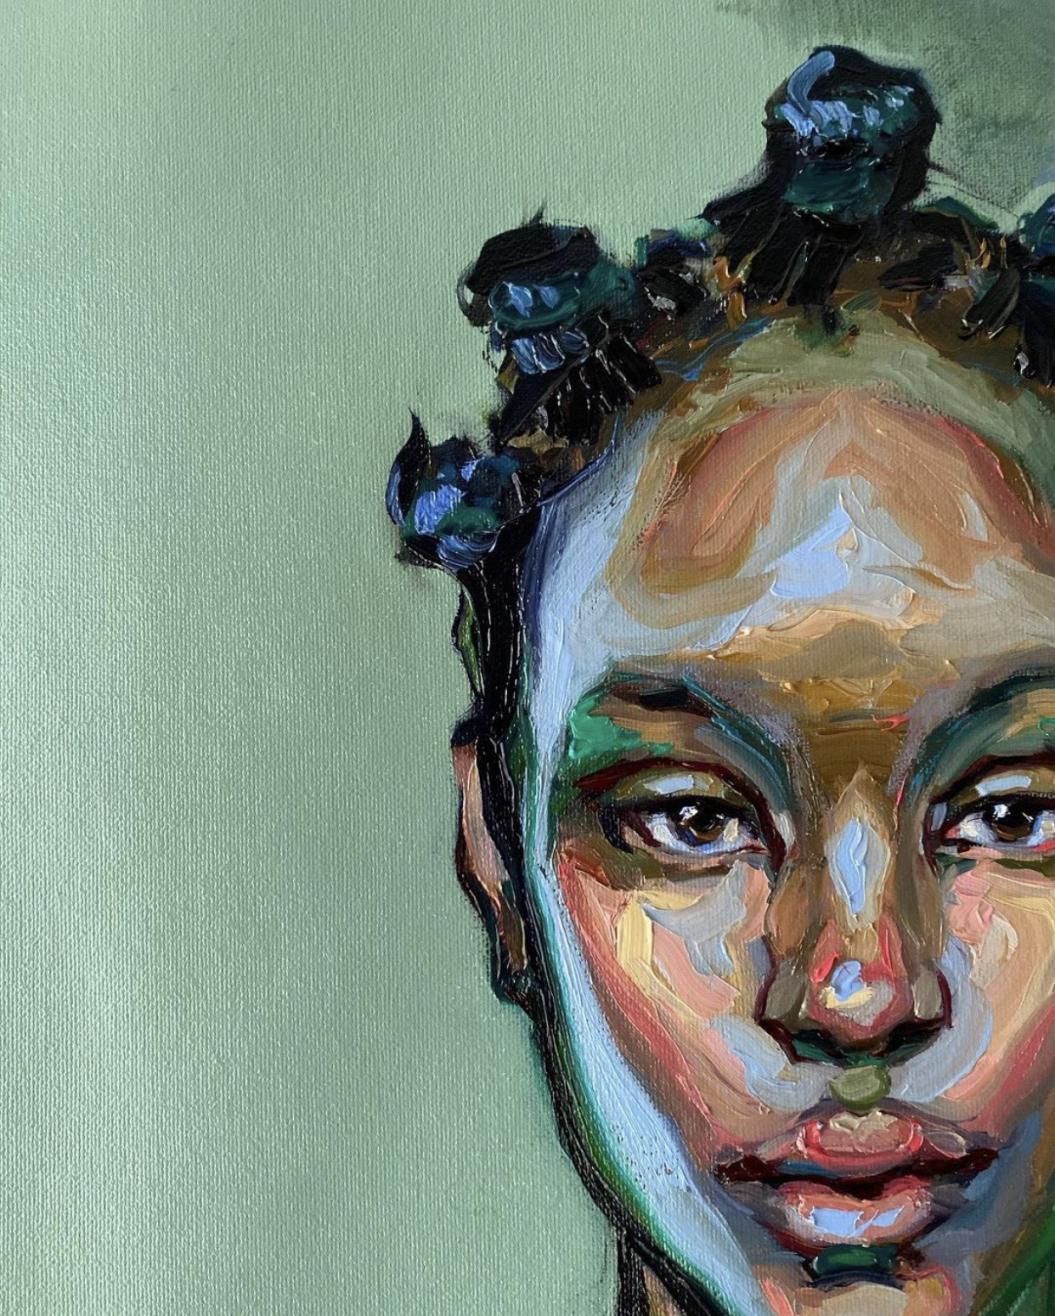 Artist of the week - Agnes Grochulska